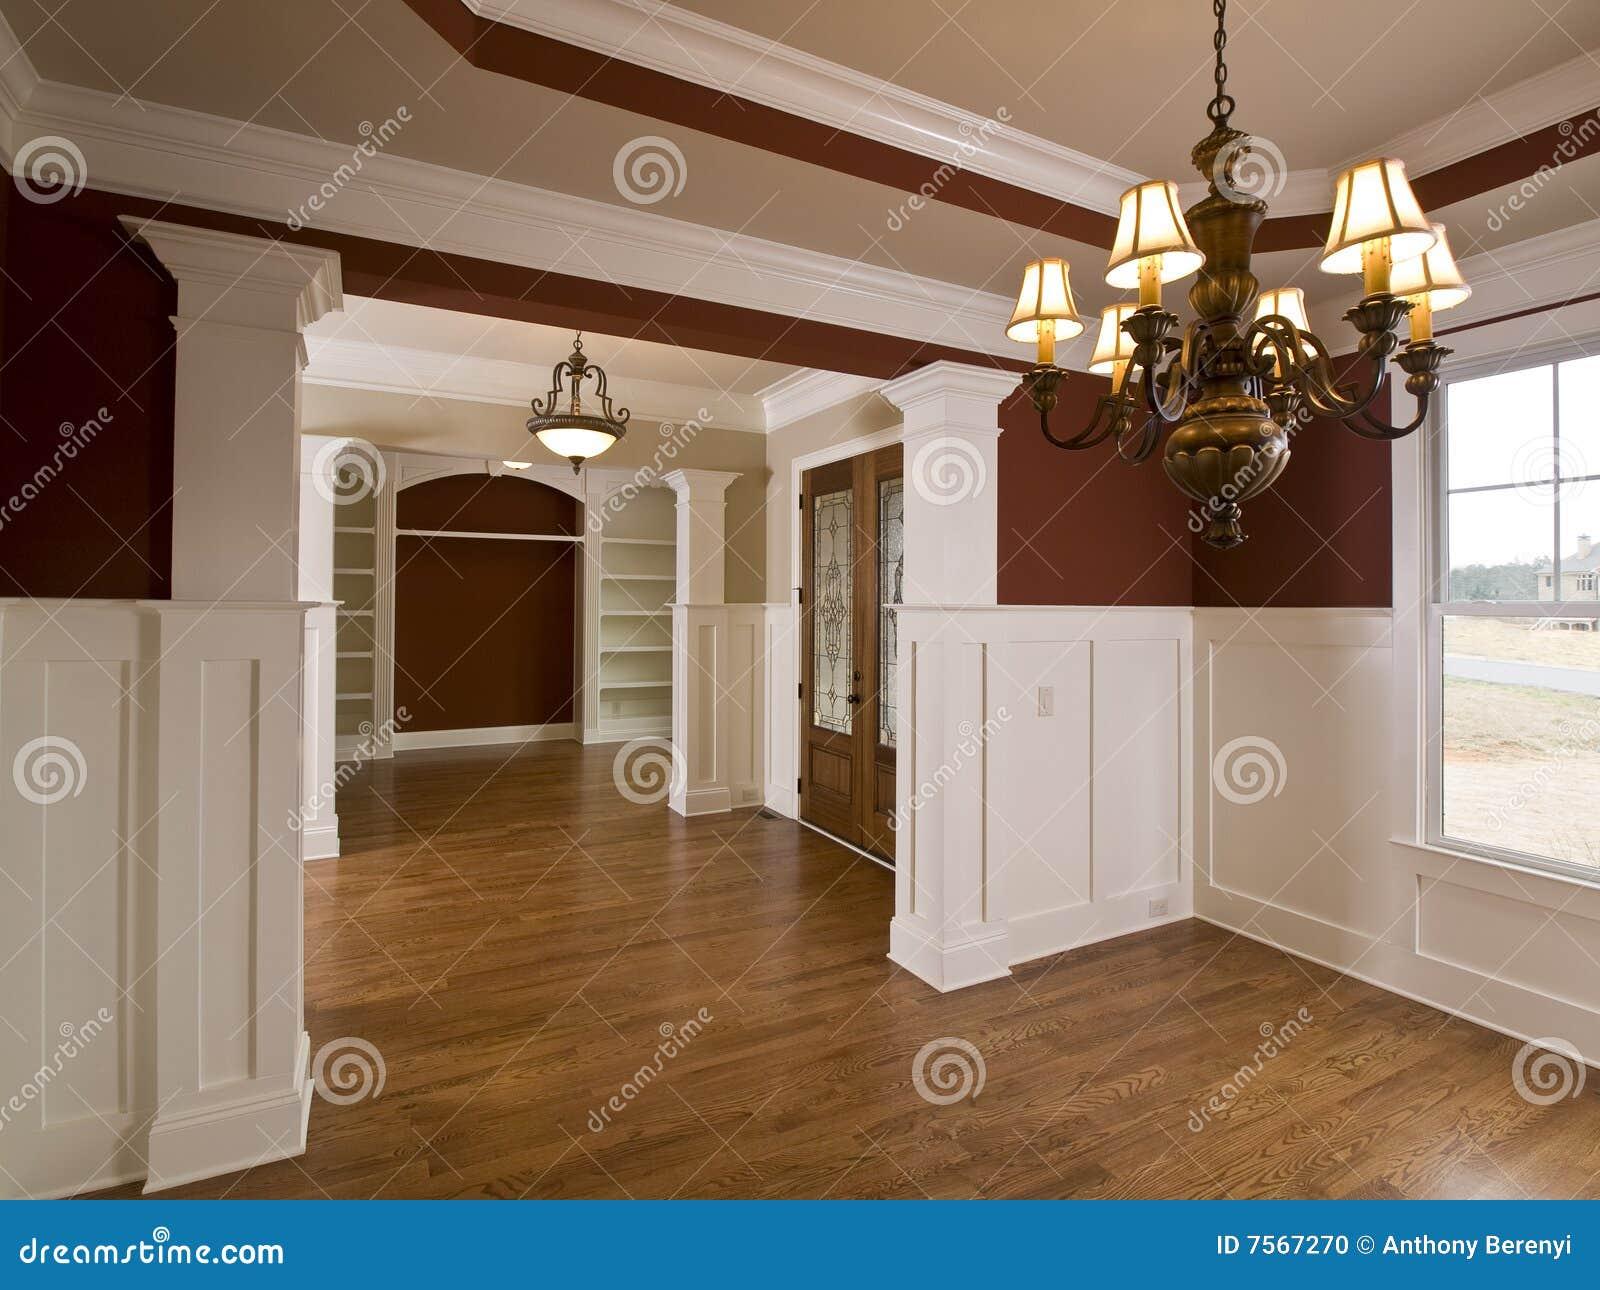 Luxury home interior foyer with lights stock photo image - Luxury foyer interior design ...